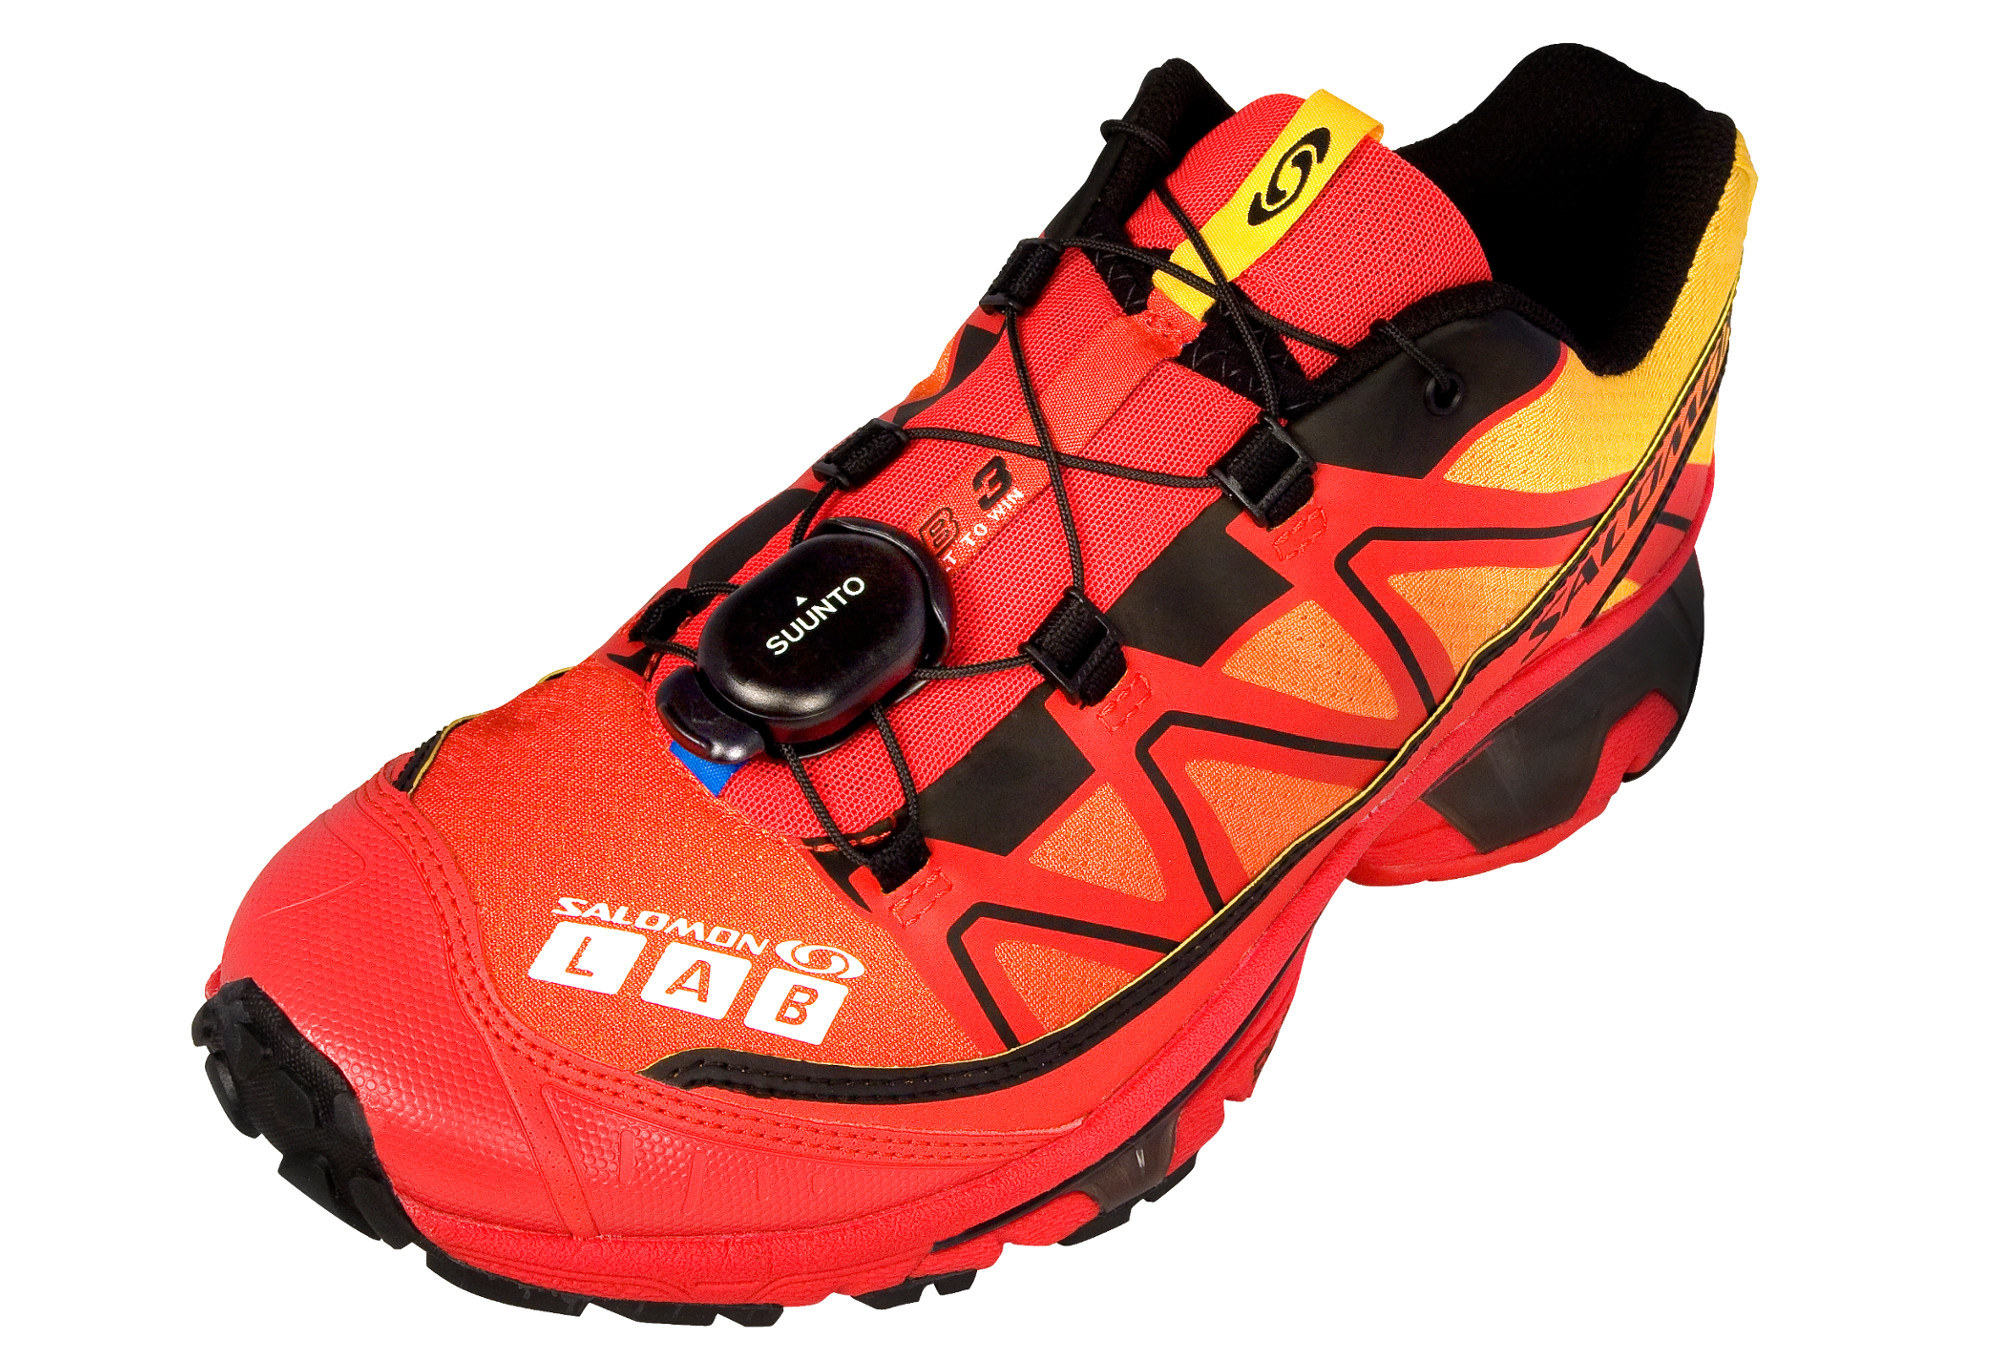 SUUNTO FOOT POD MINI | Alltricks.com